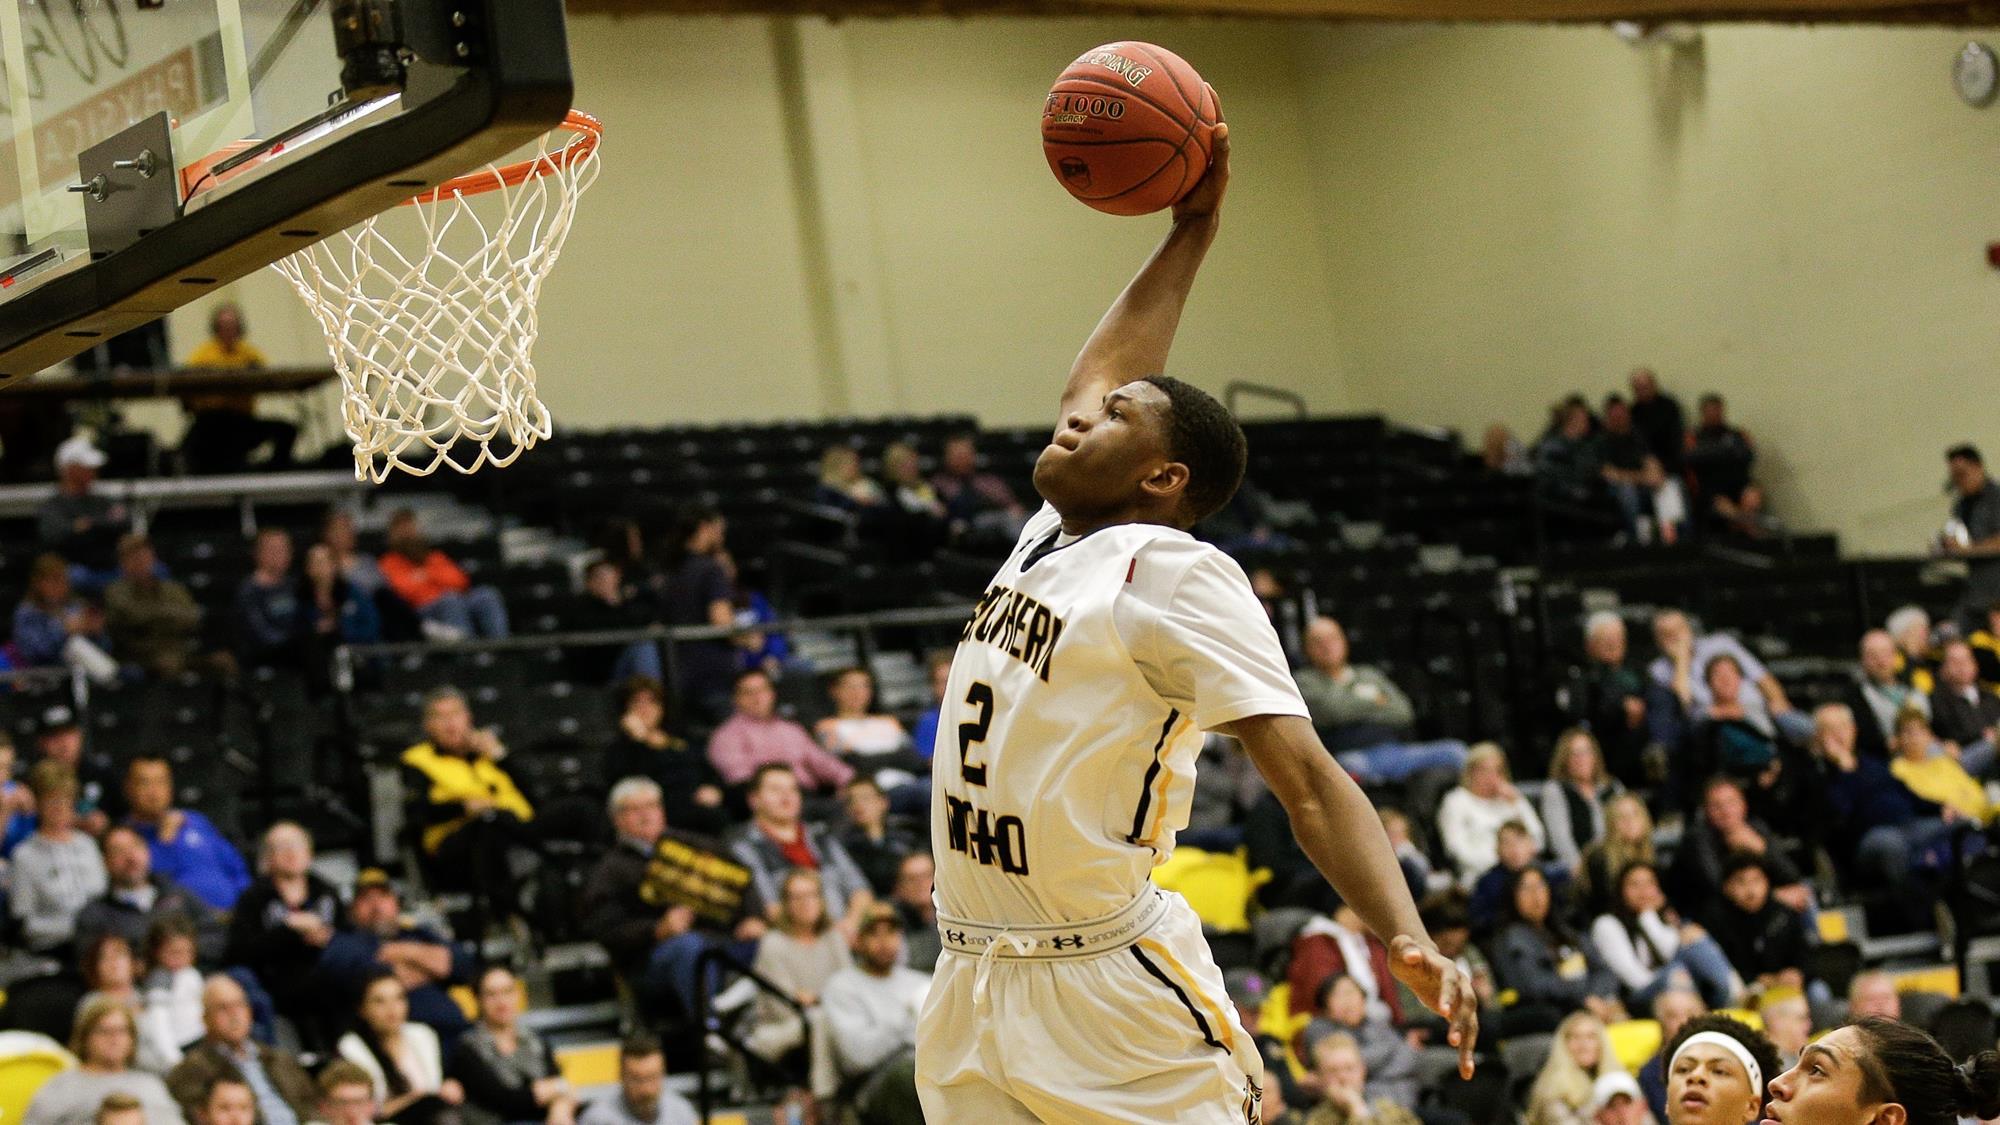 South Alabama basketball lands JUCO guard David Walker for 2020 class